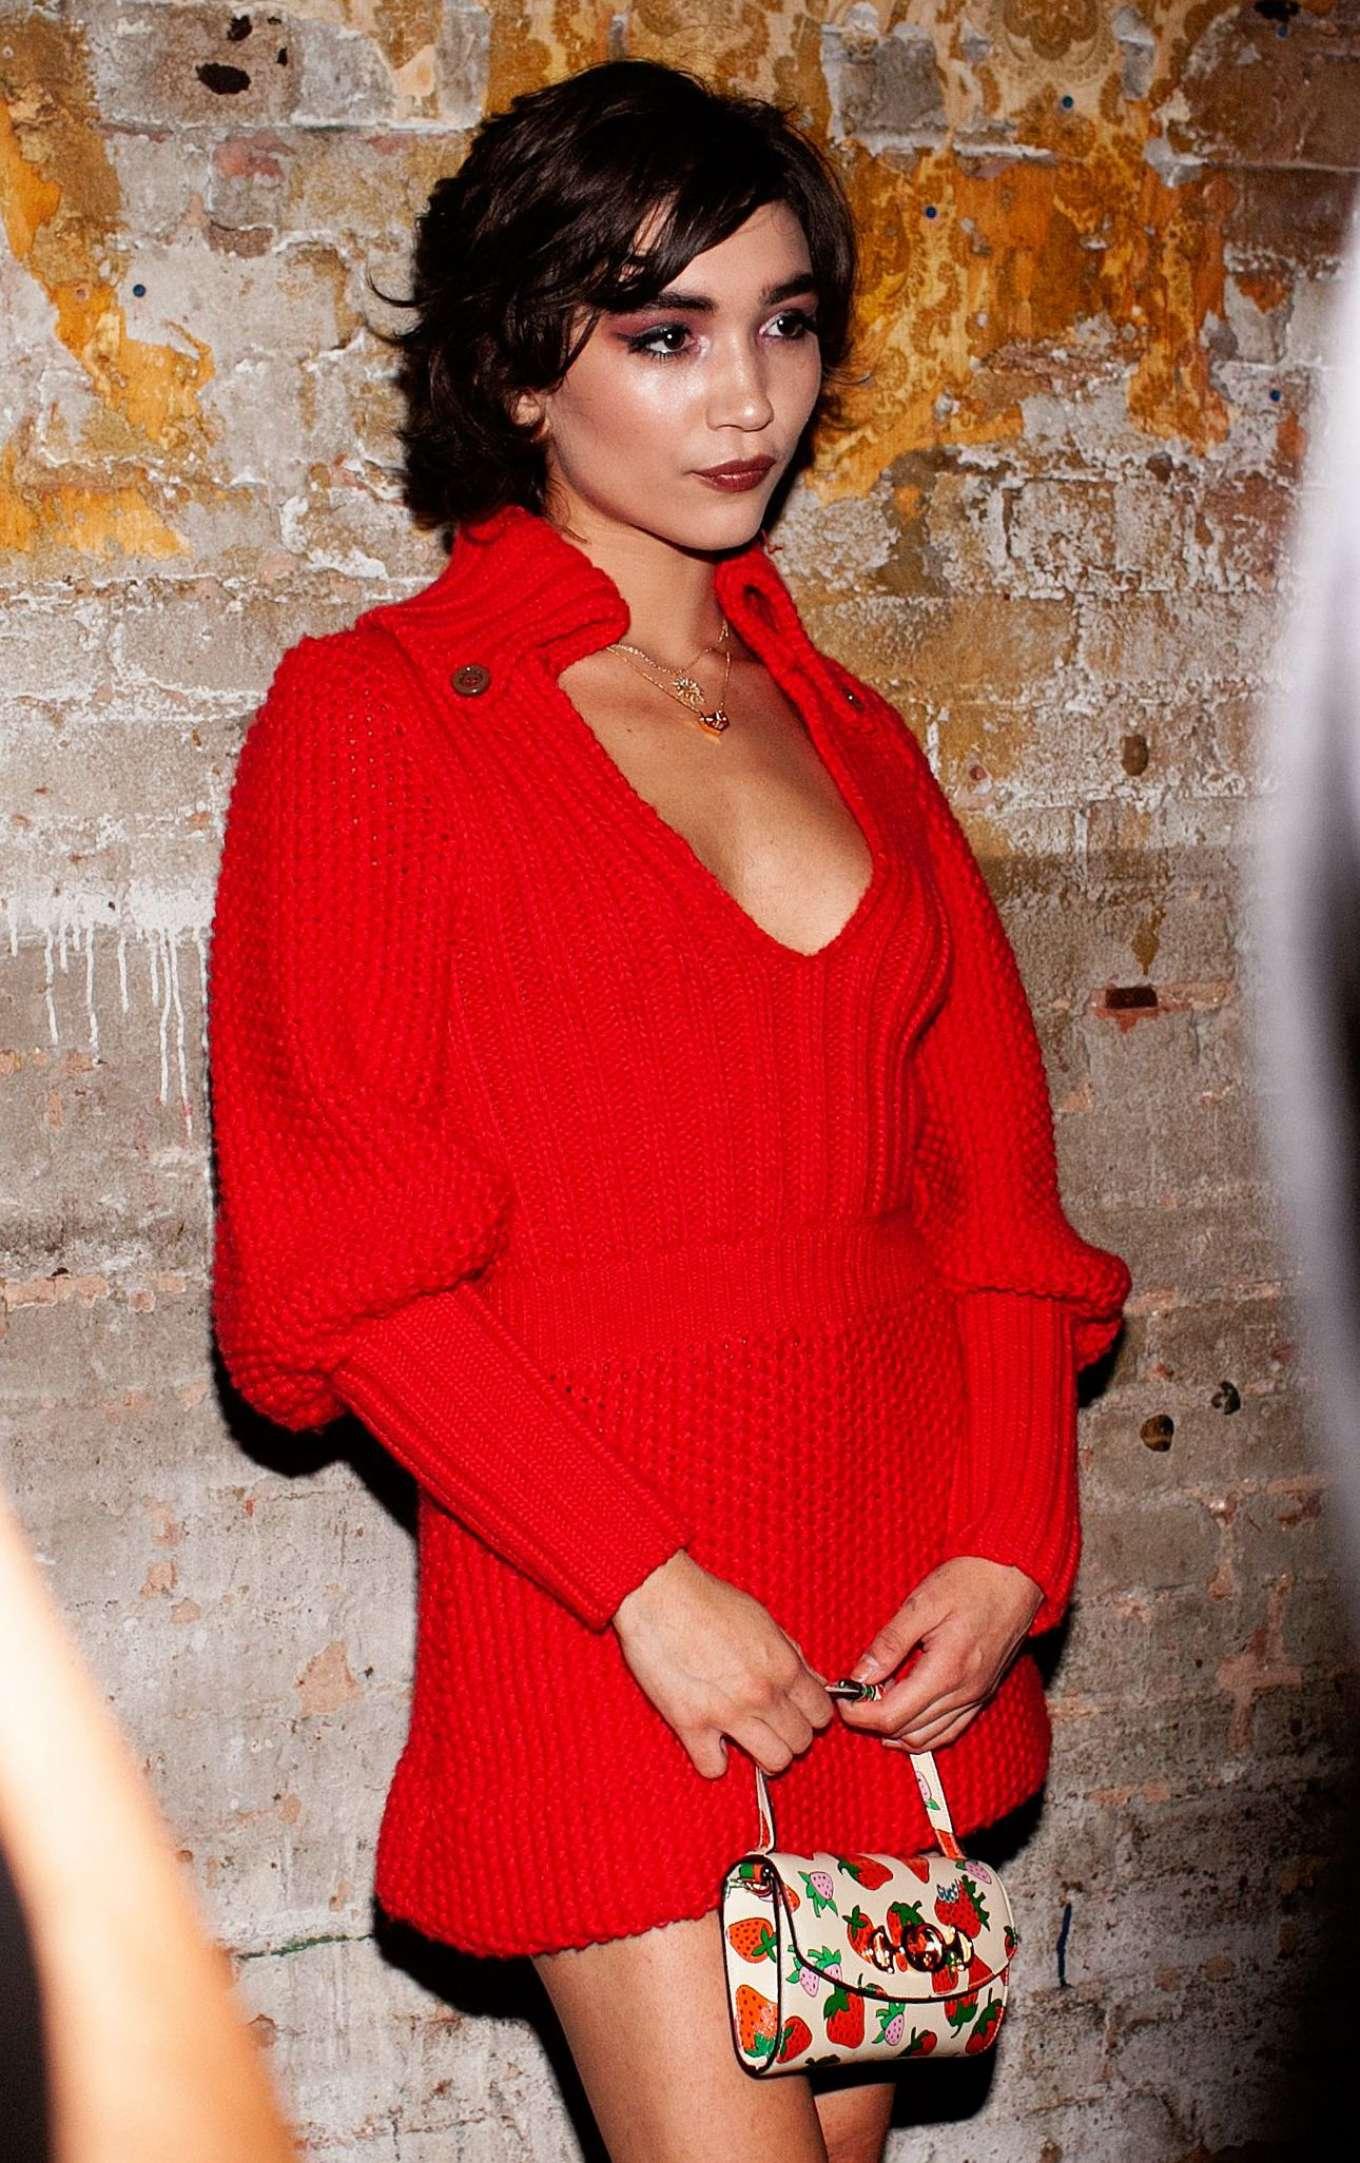 Rowan Blanchard - Gucci and Saks NYFW Party in NYC